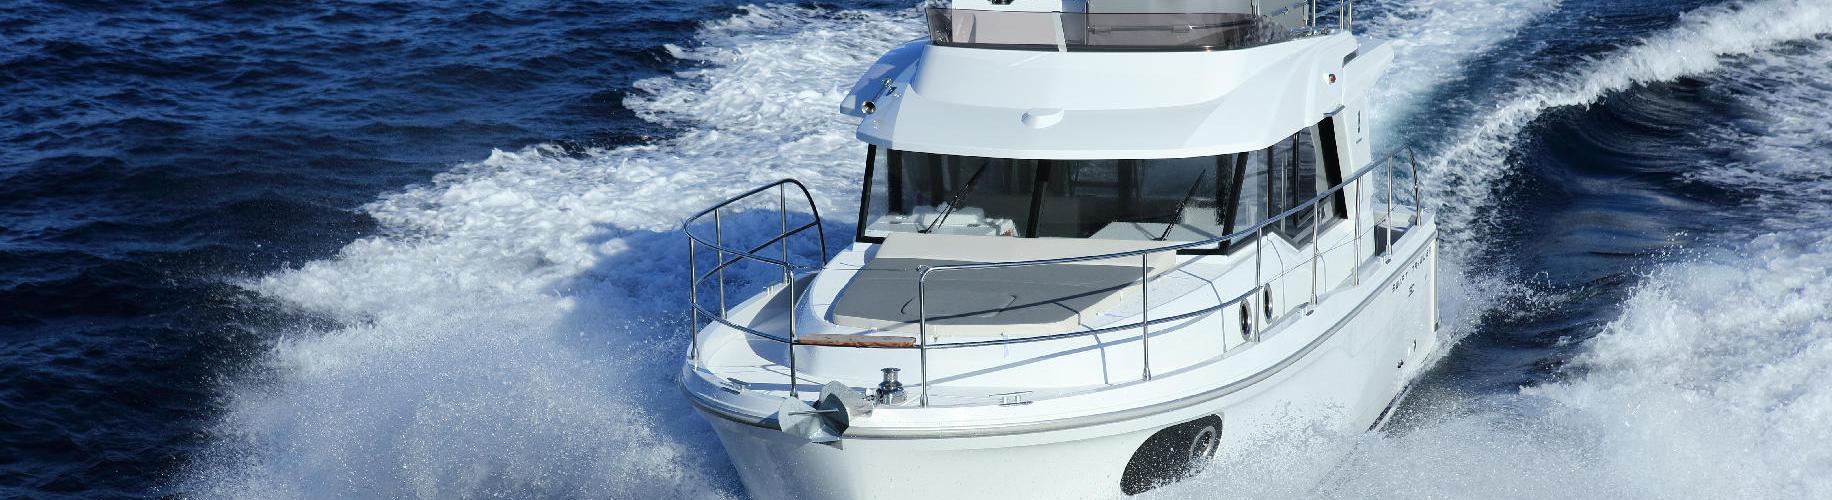 Motoryacht Swift Trawler 30